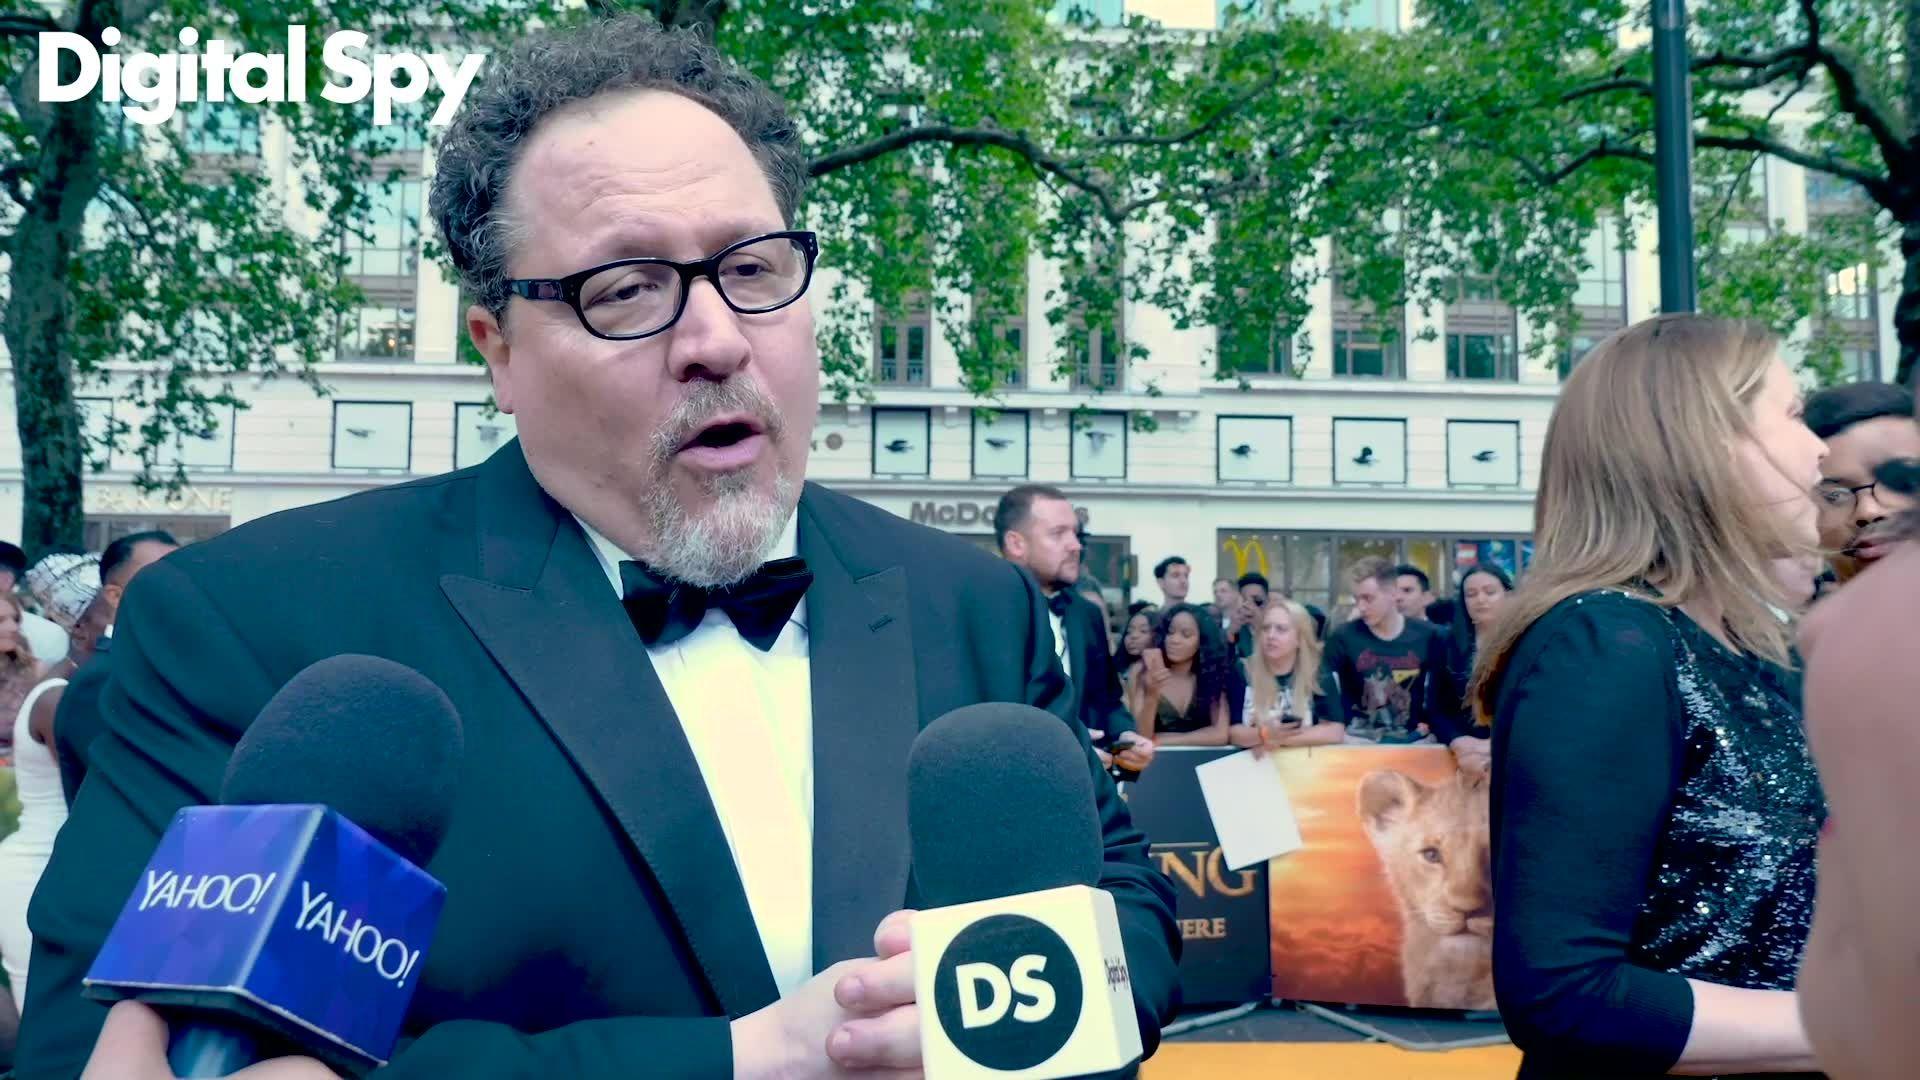 The Lion King director responds to 'Hakuna Matata' backlash